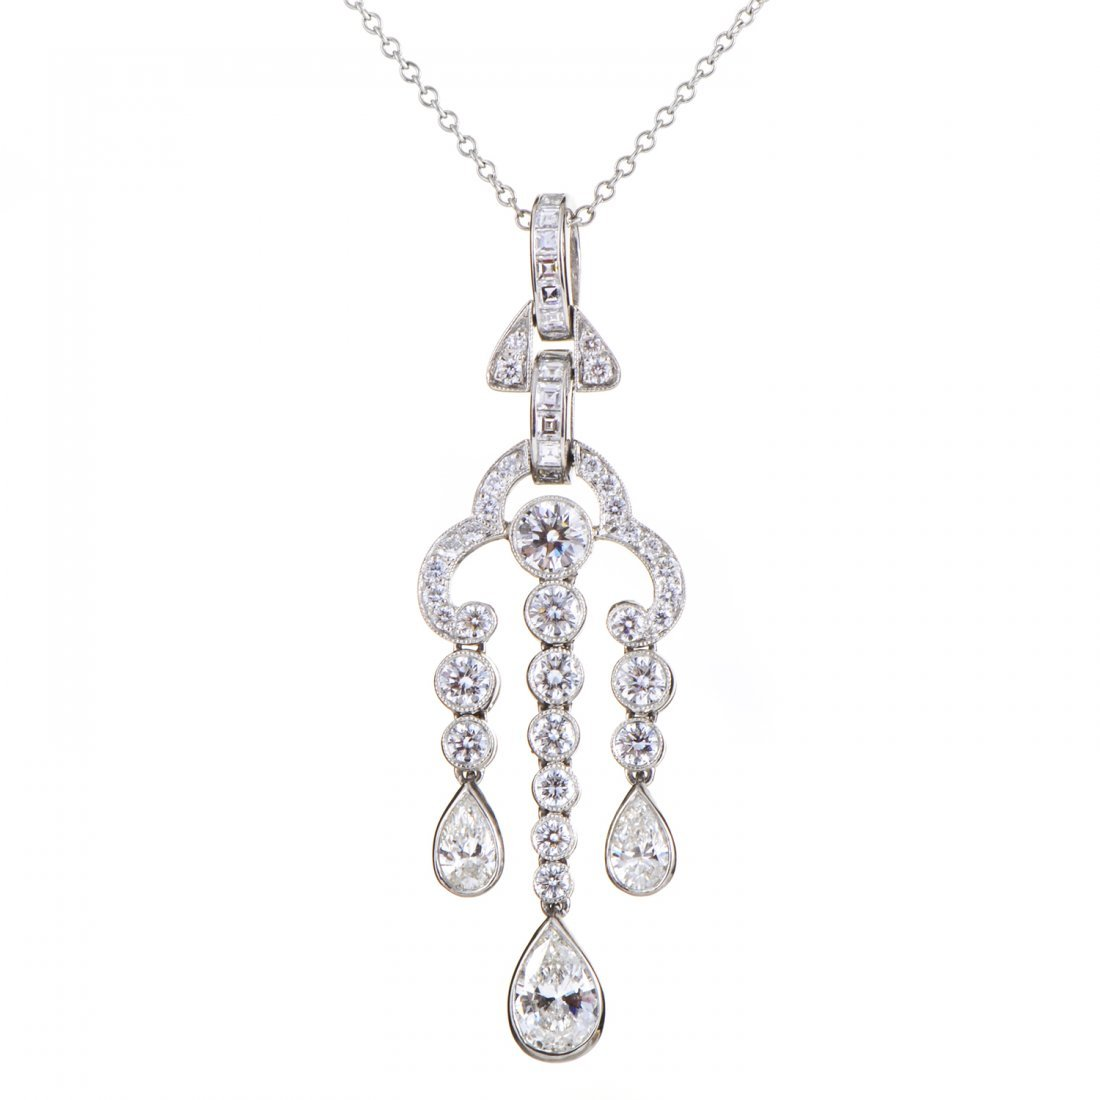 Tiffany & Co. Platinum Diamond Pendant Necklace